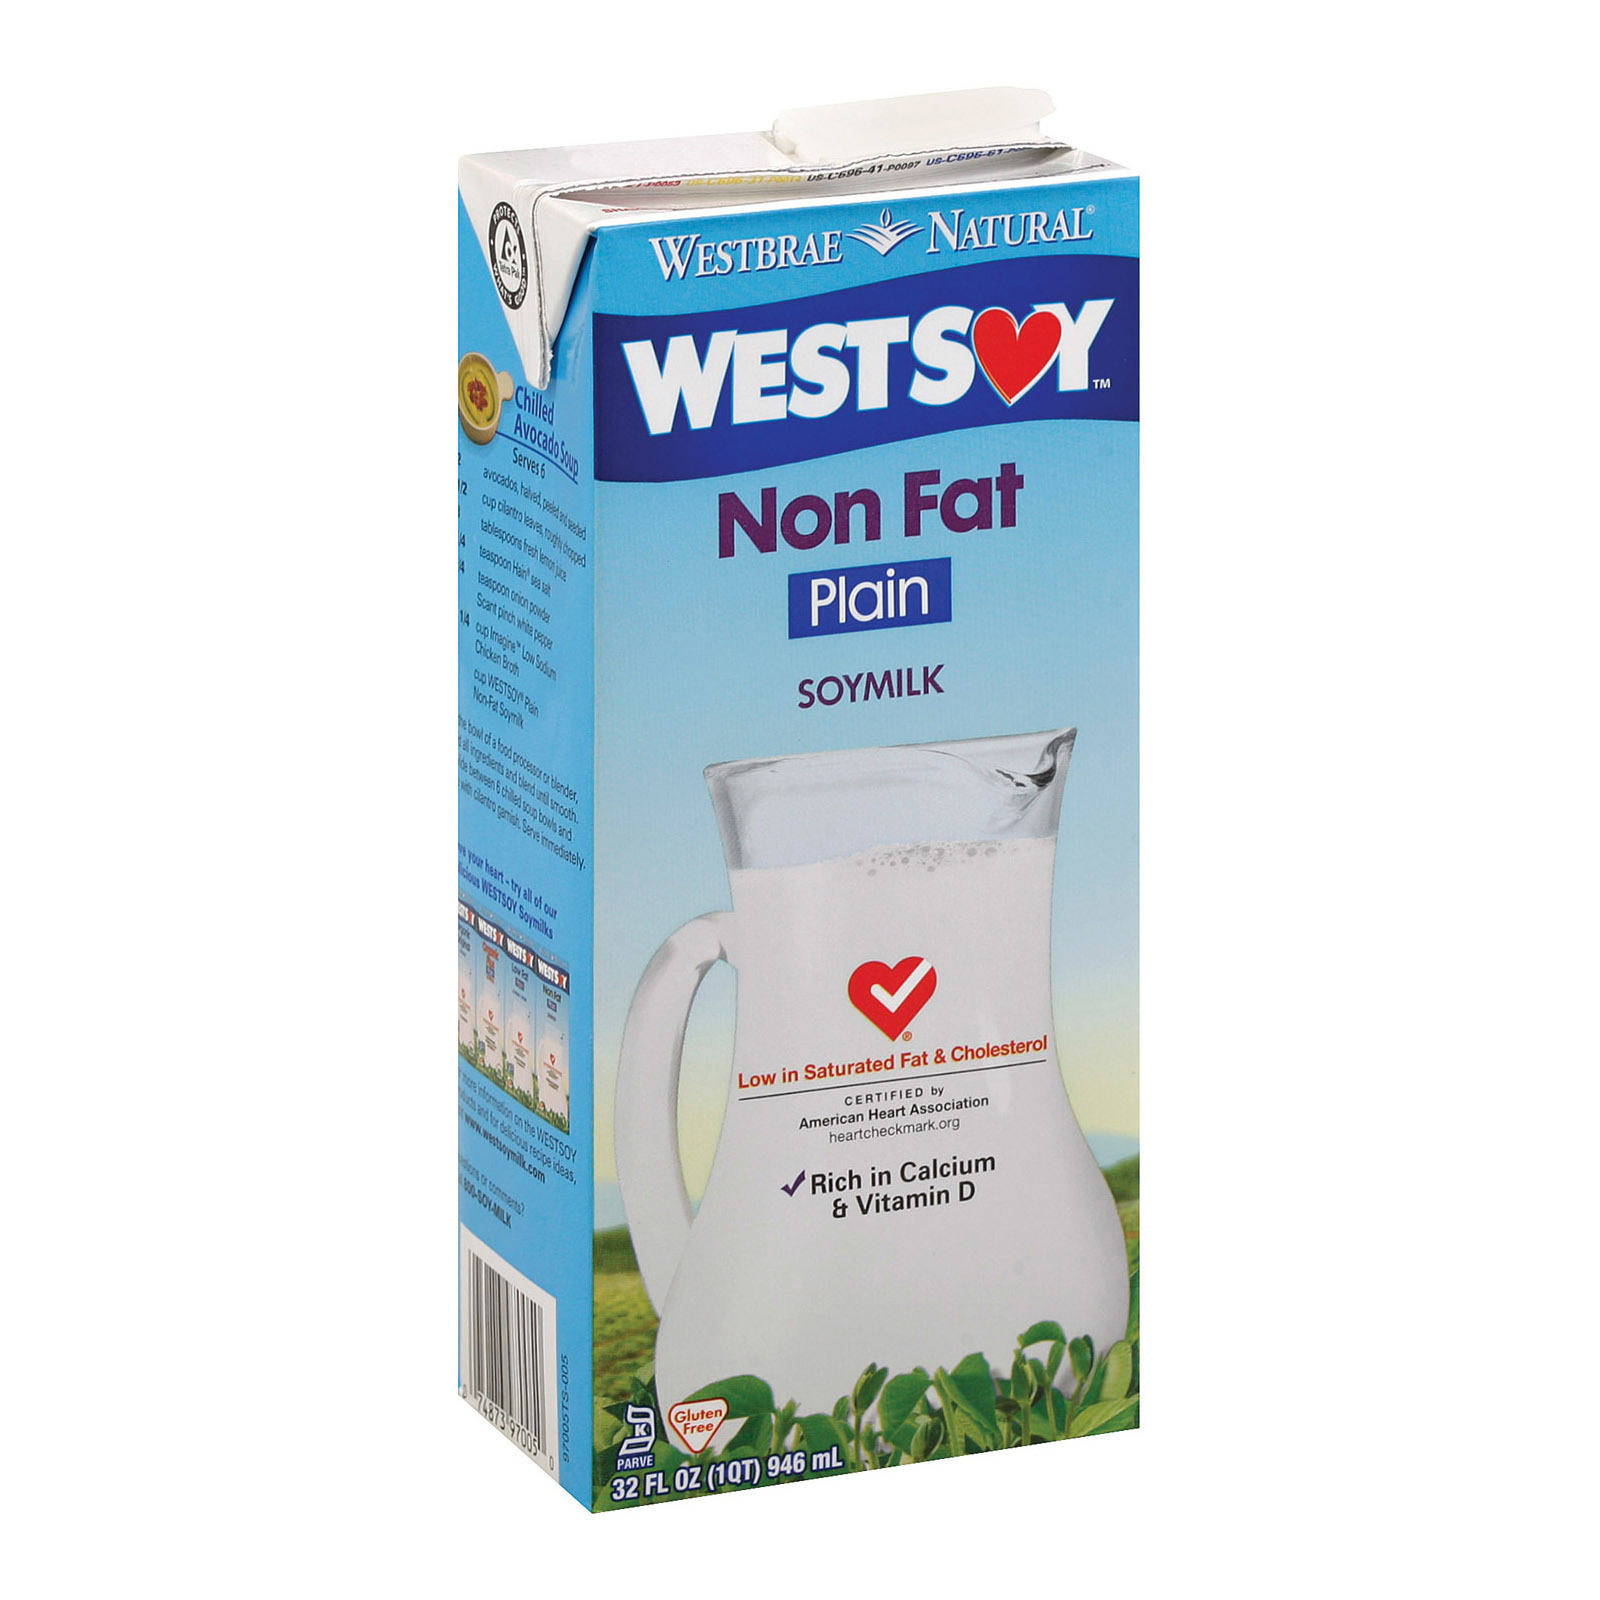 Westsoy Non Fat Soymilk - Plain - Case of 12 - 32 Fl oz.